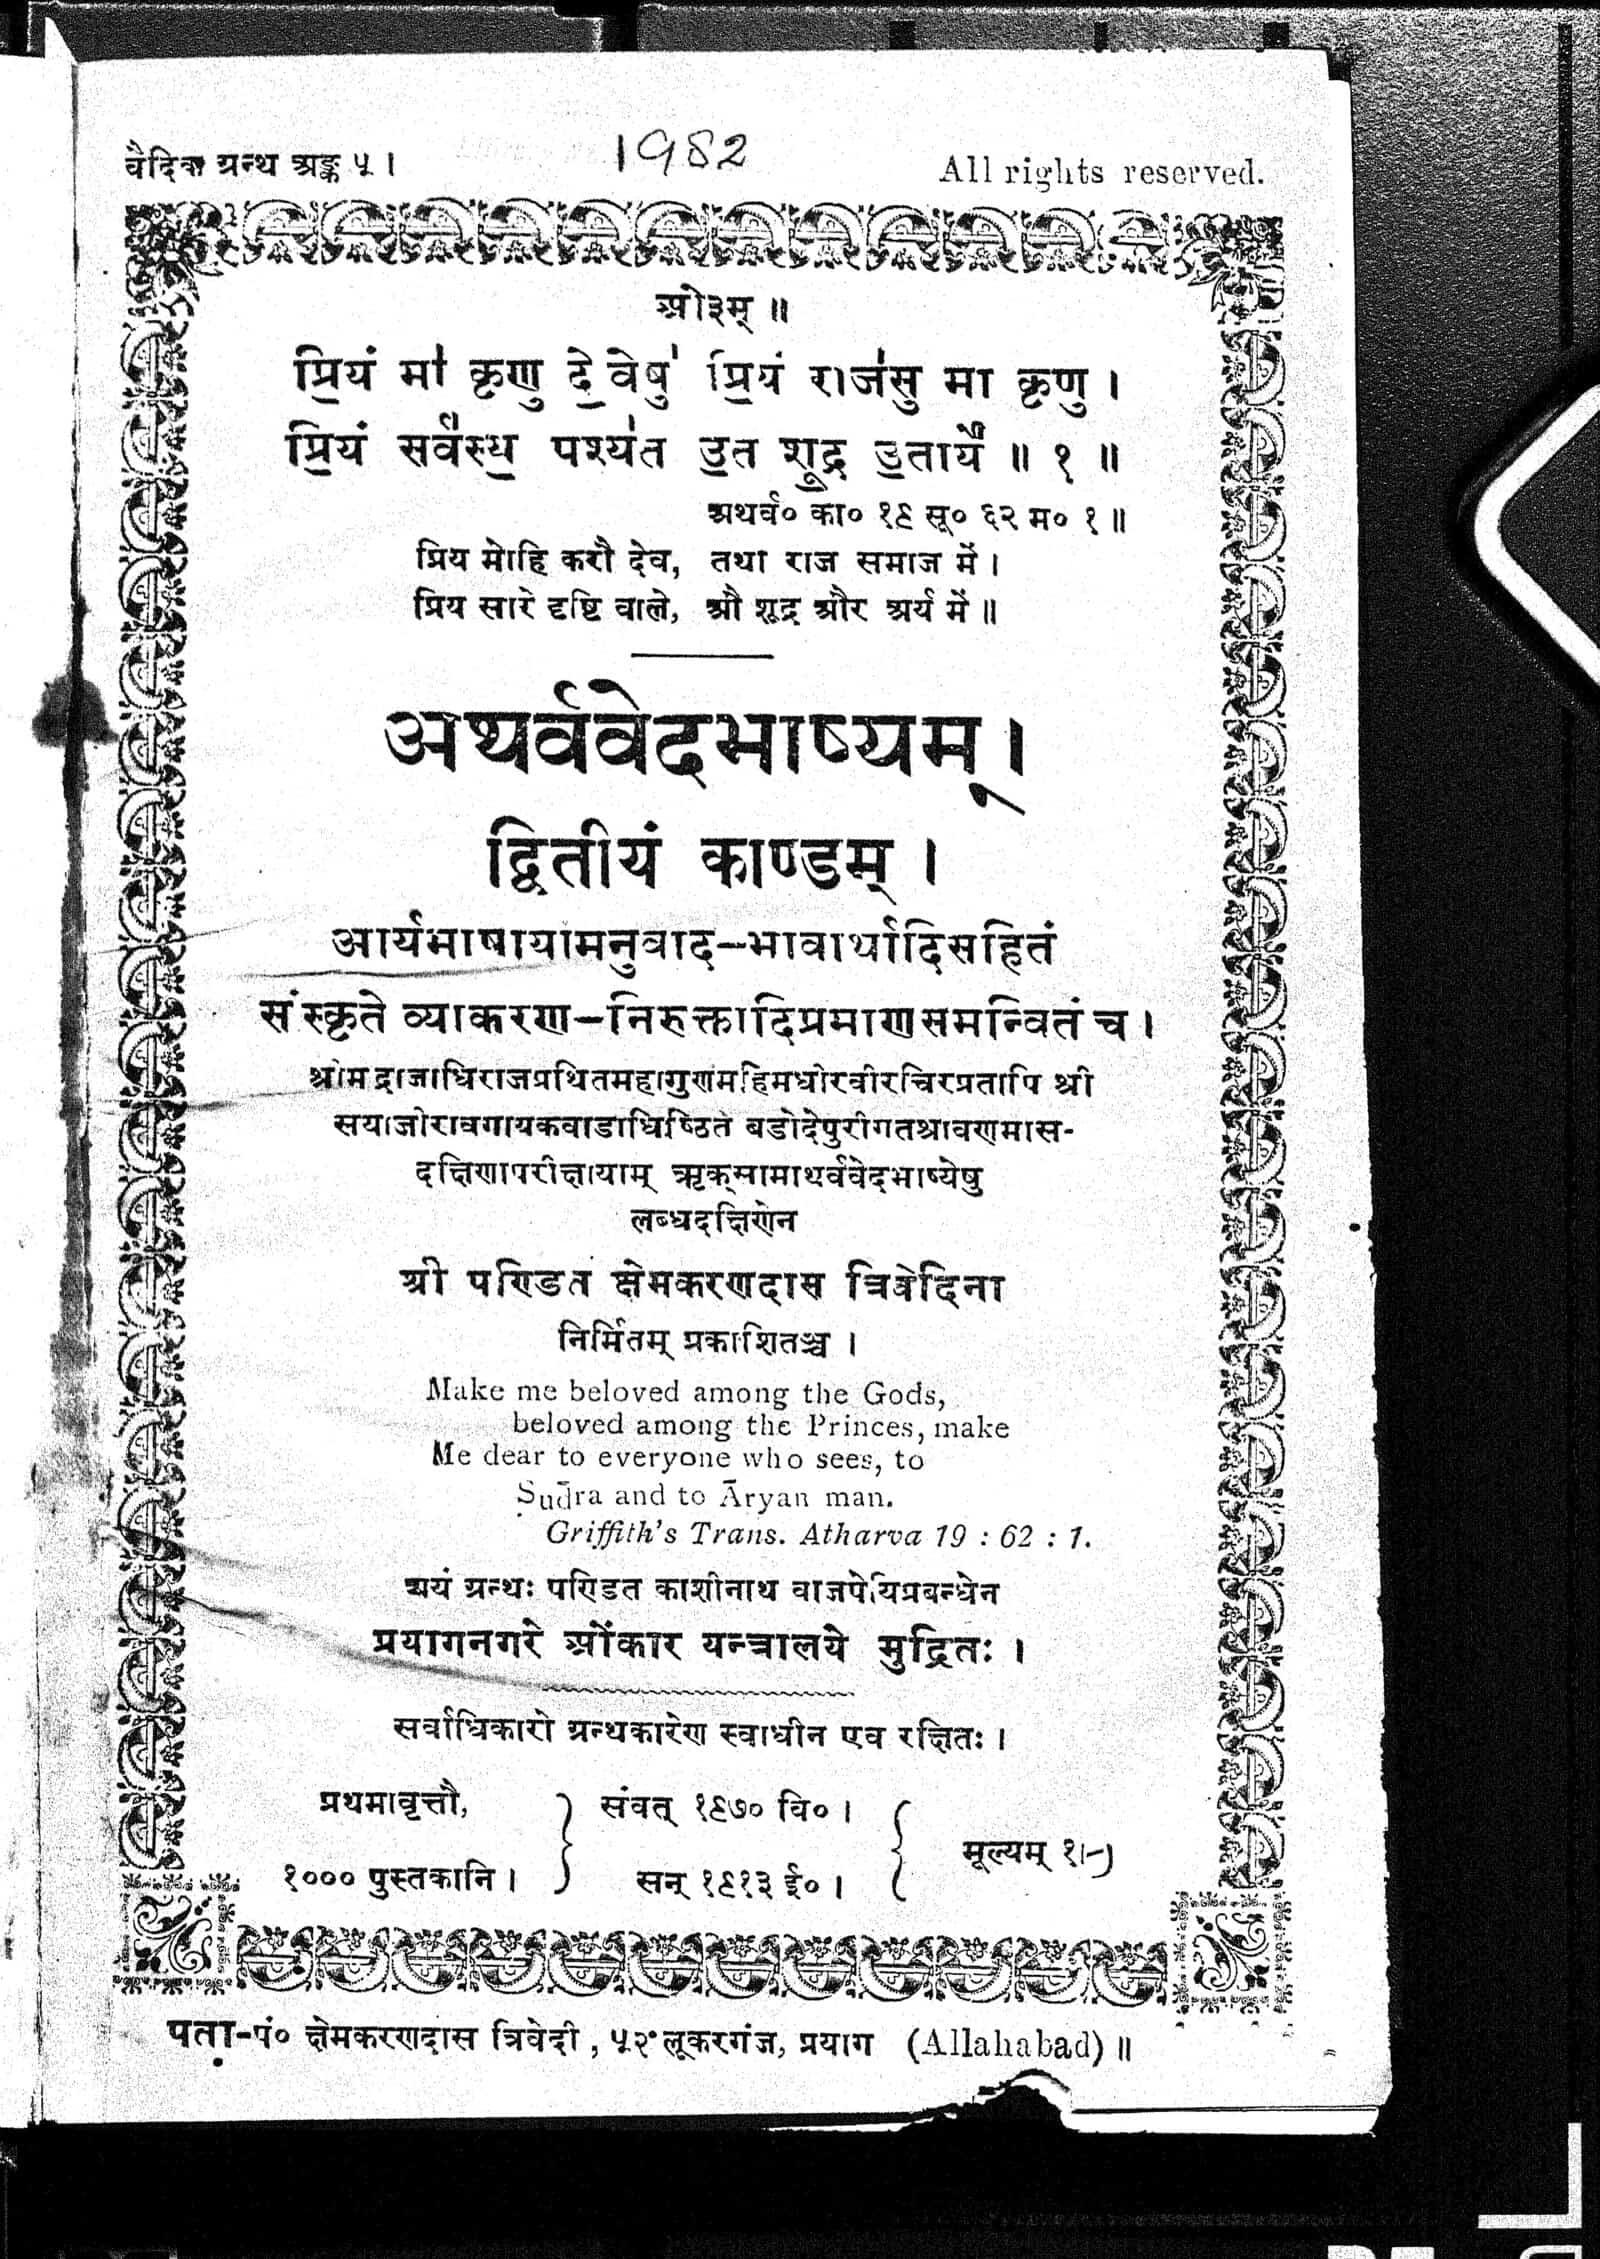 Book Image : अर्थववेद भाष्यम खंड २ - Arthavved Bhashyam Khand 2